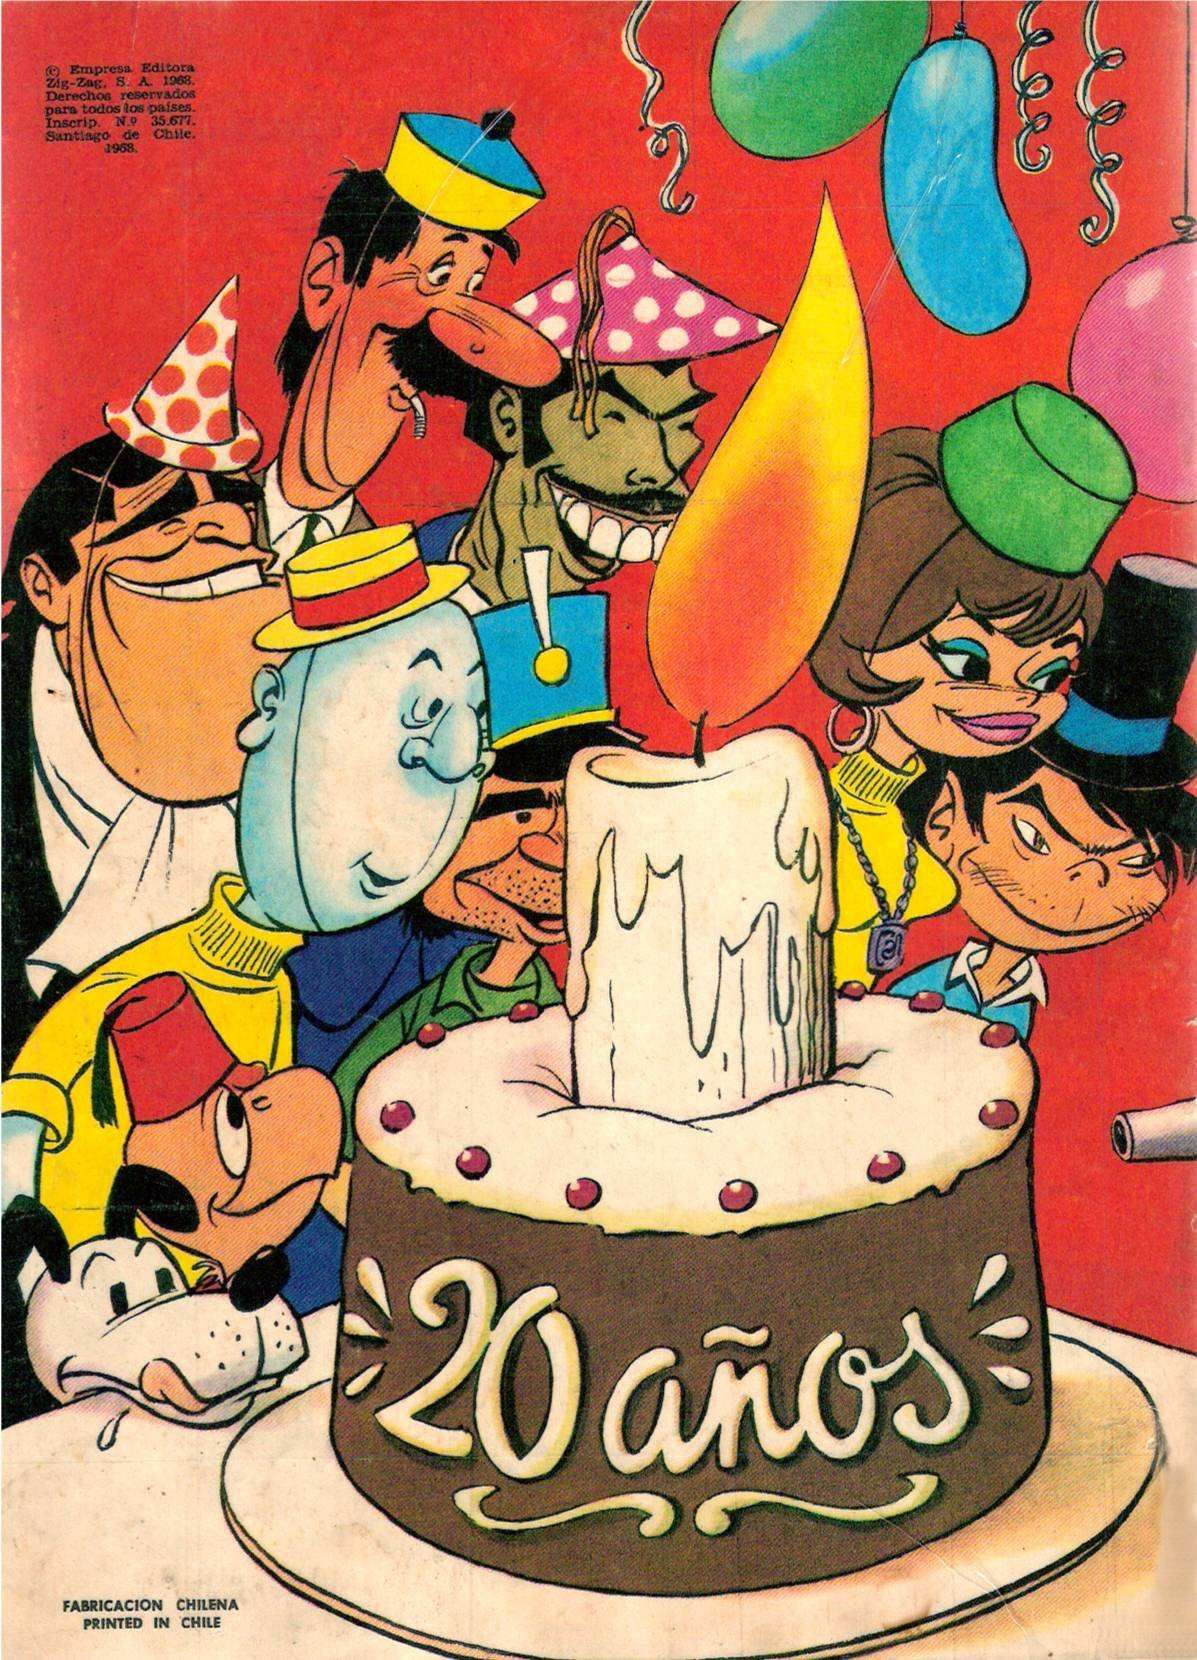 ¡Feliz cumpleaños a mi!